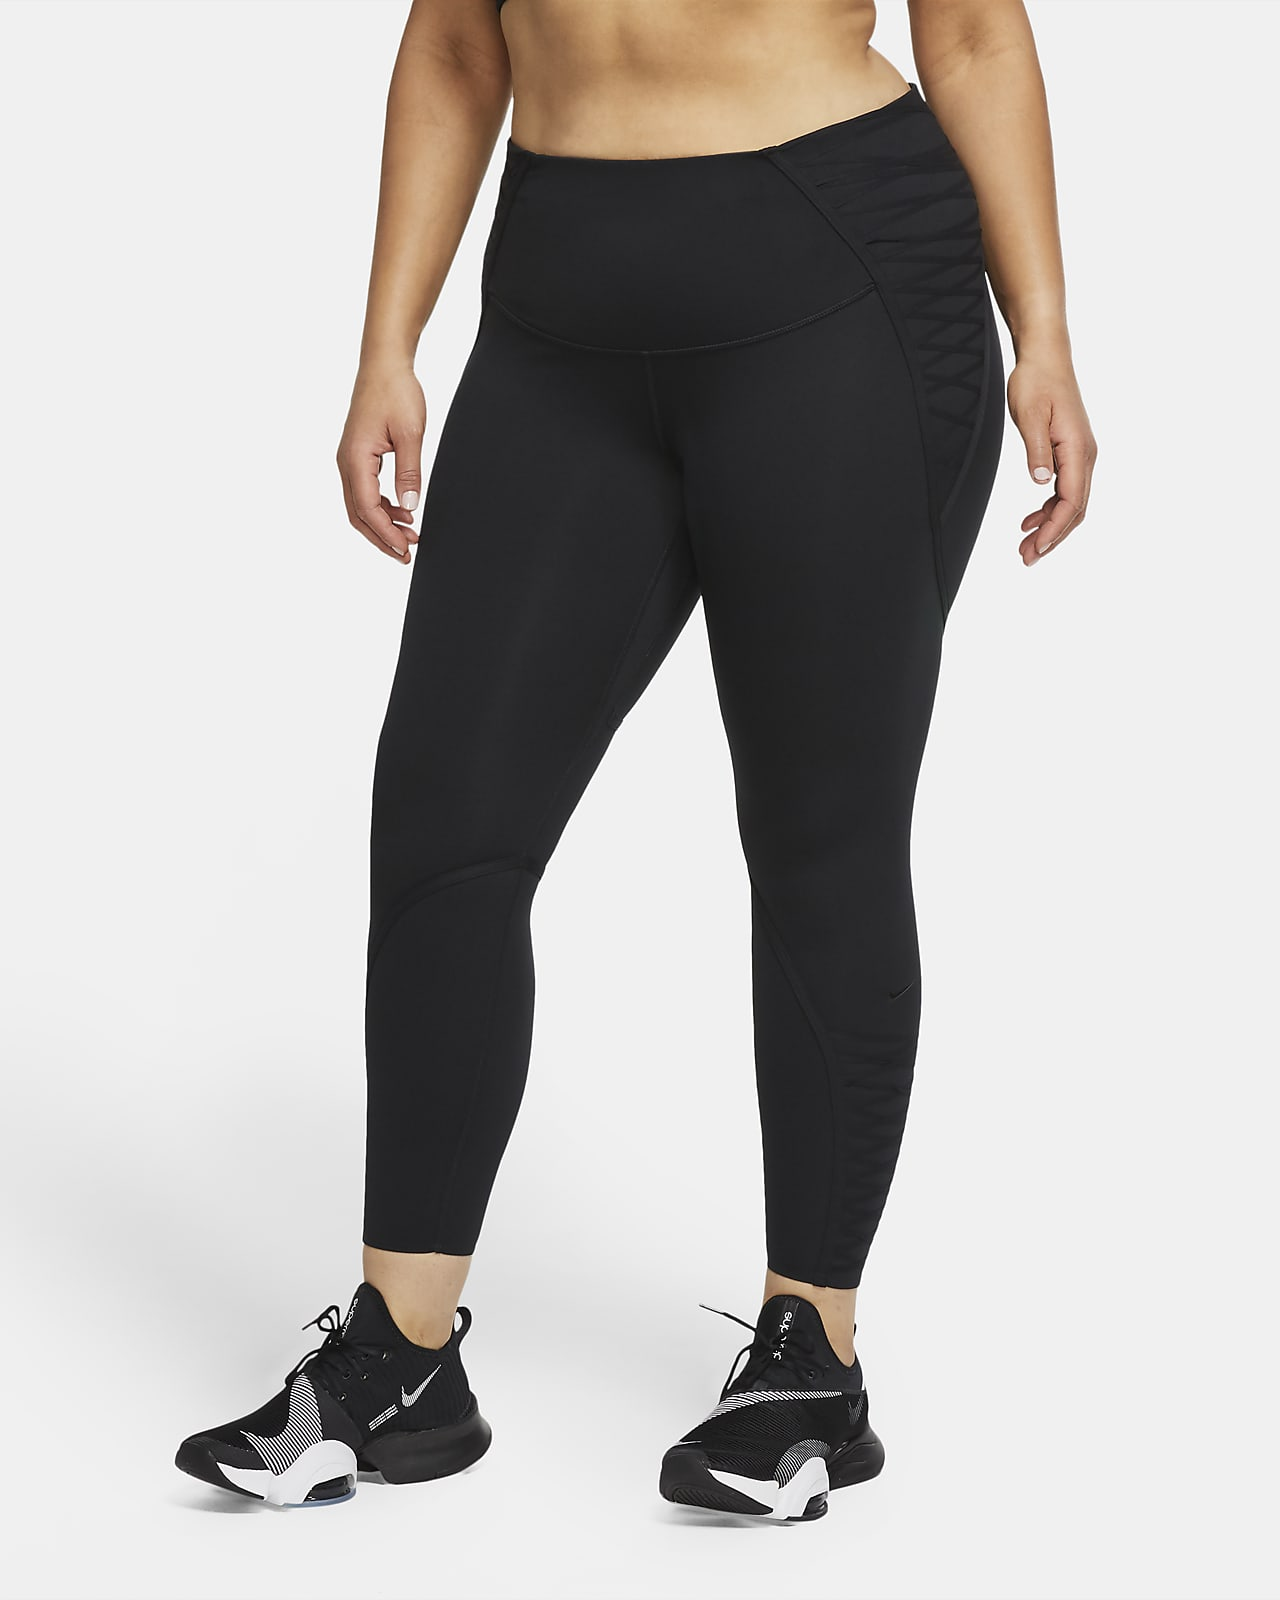 Legging 7/8 à lacet Nike One Luxe pour Femme (grande taille)